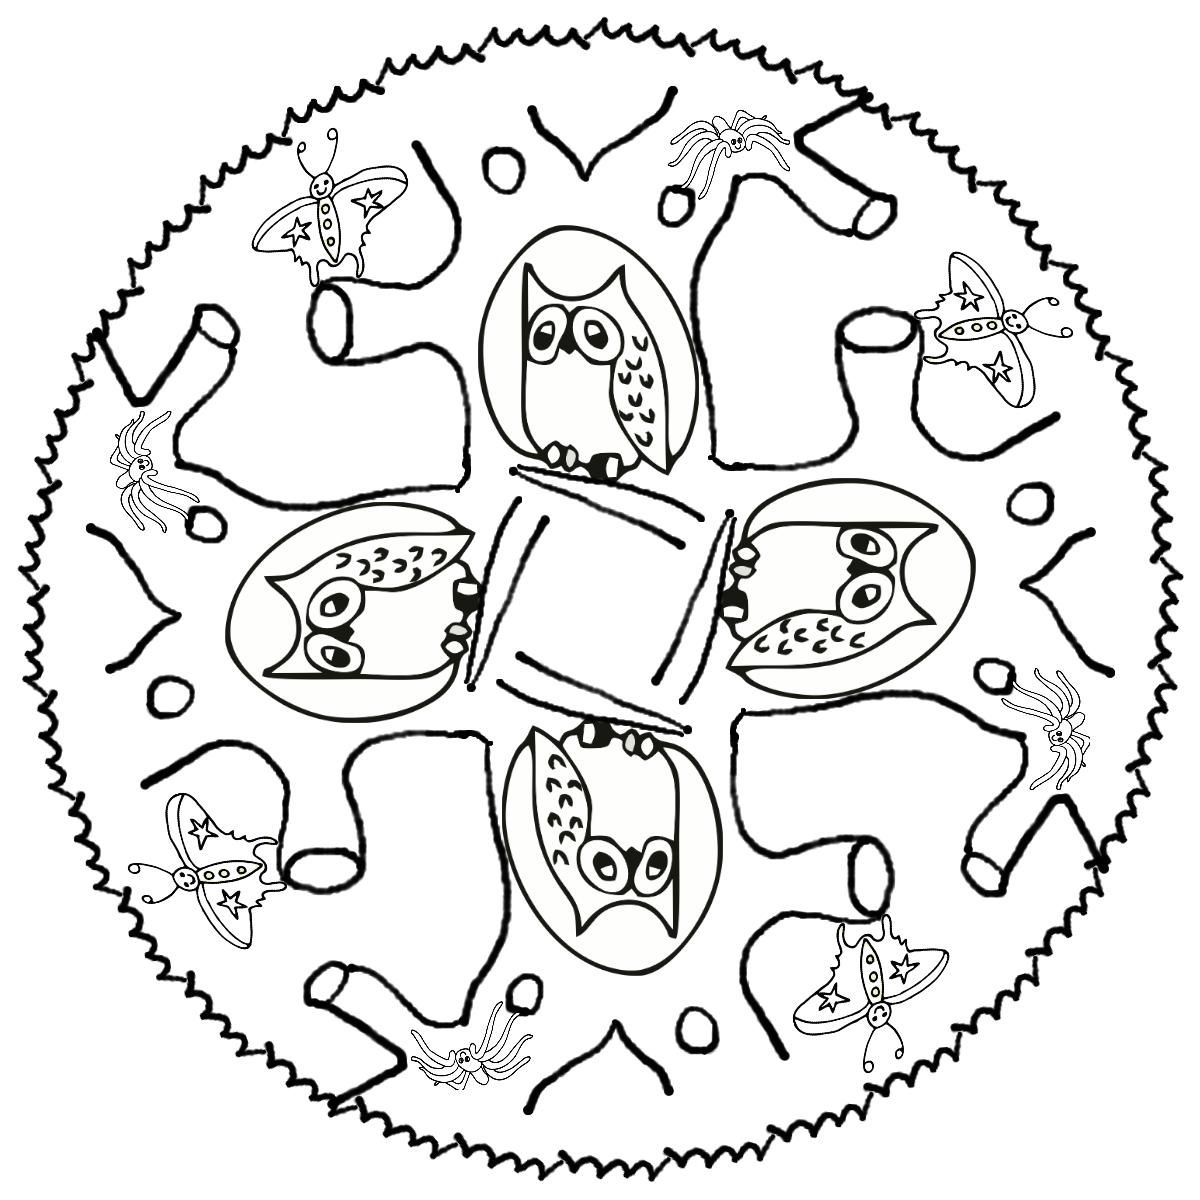 Eulen Mandala Tiere 1118 Malvorlage Eule Ausmalbilder Kostenlos Eulen Mandala Tiere Zum Ausdrucken